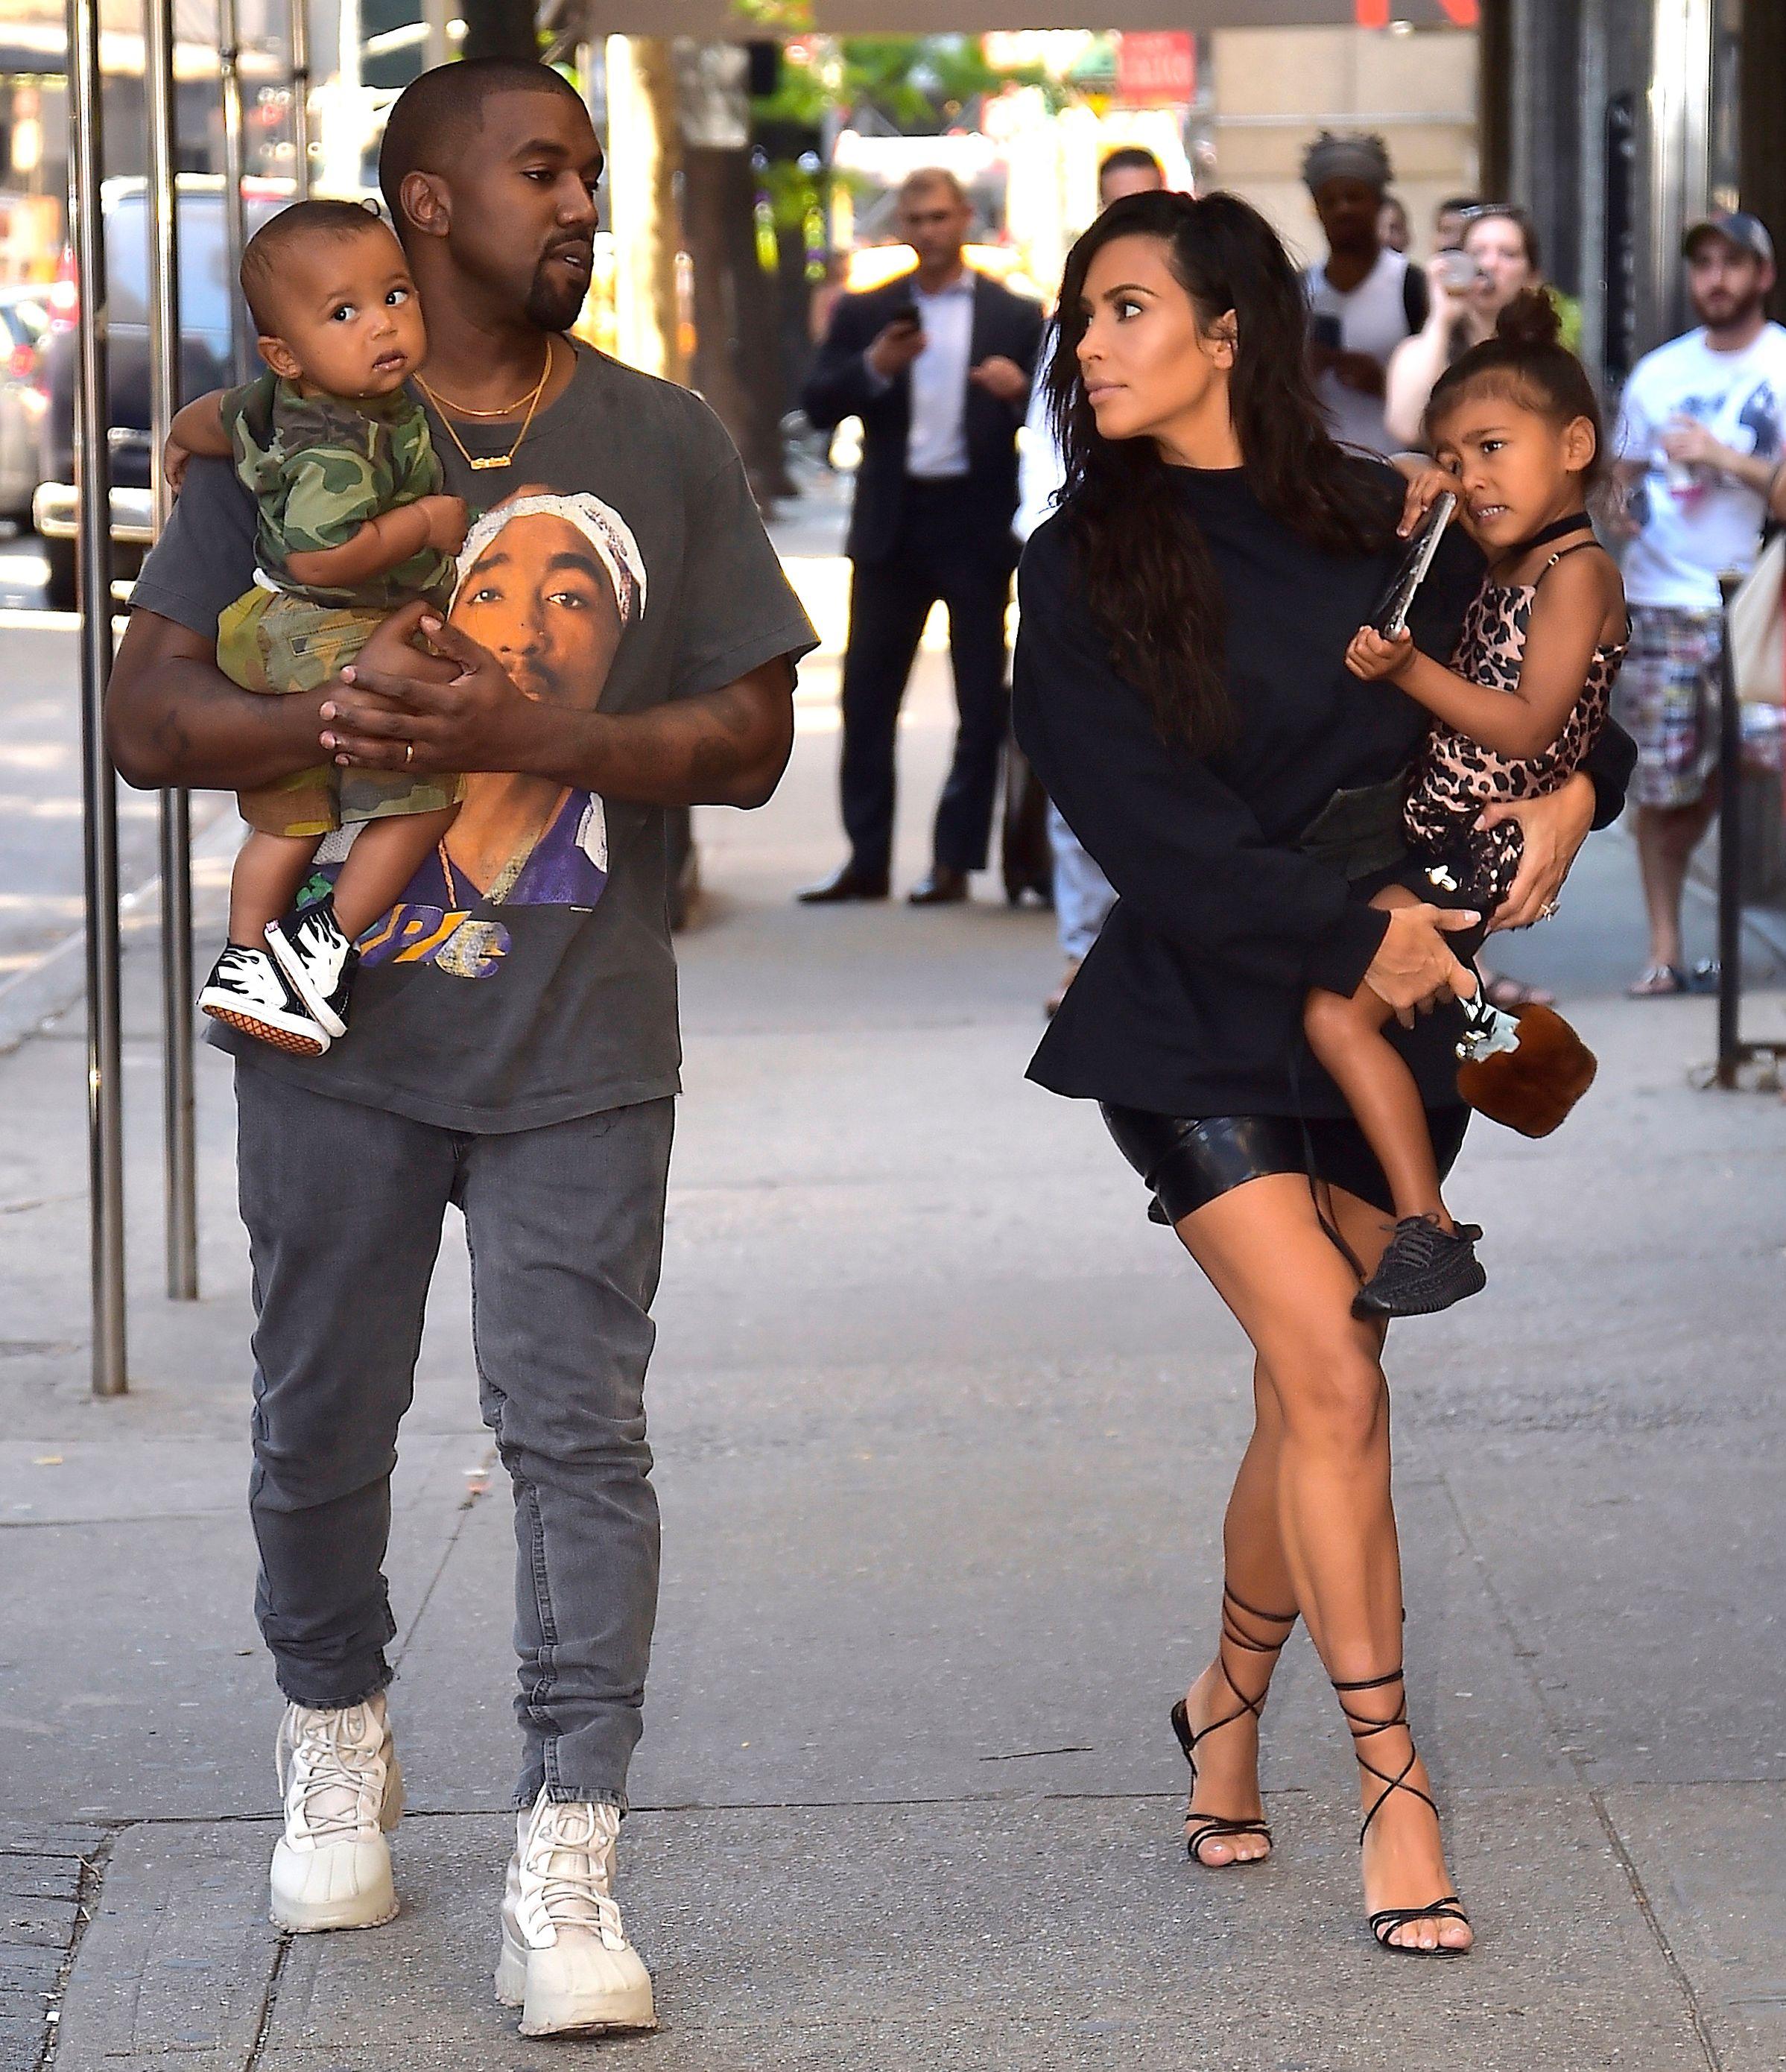 Kanye West & Kim Kardashian Expecting Their Fourth Child Via Surrogate